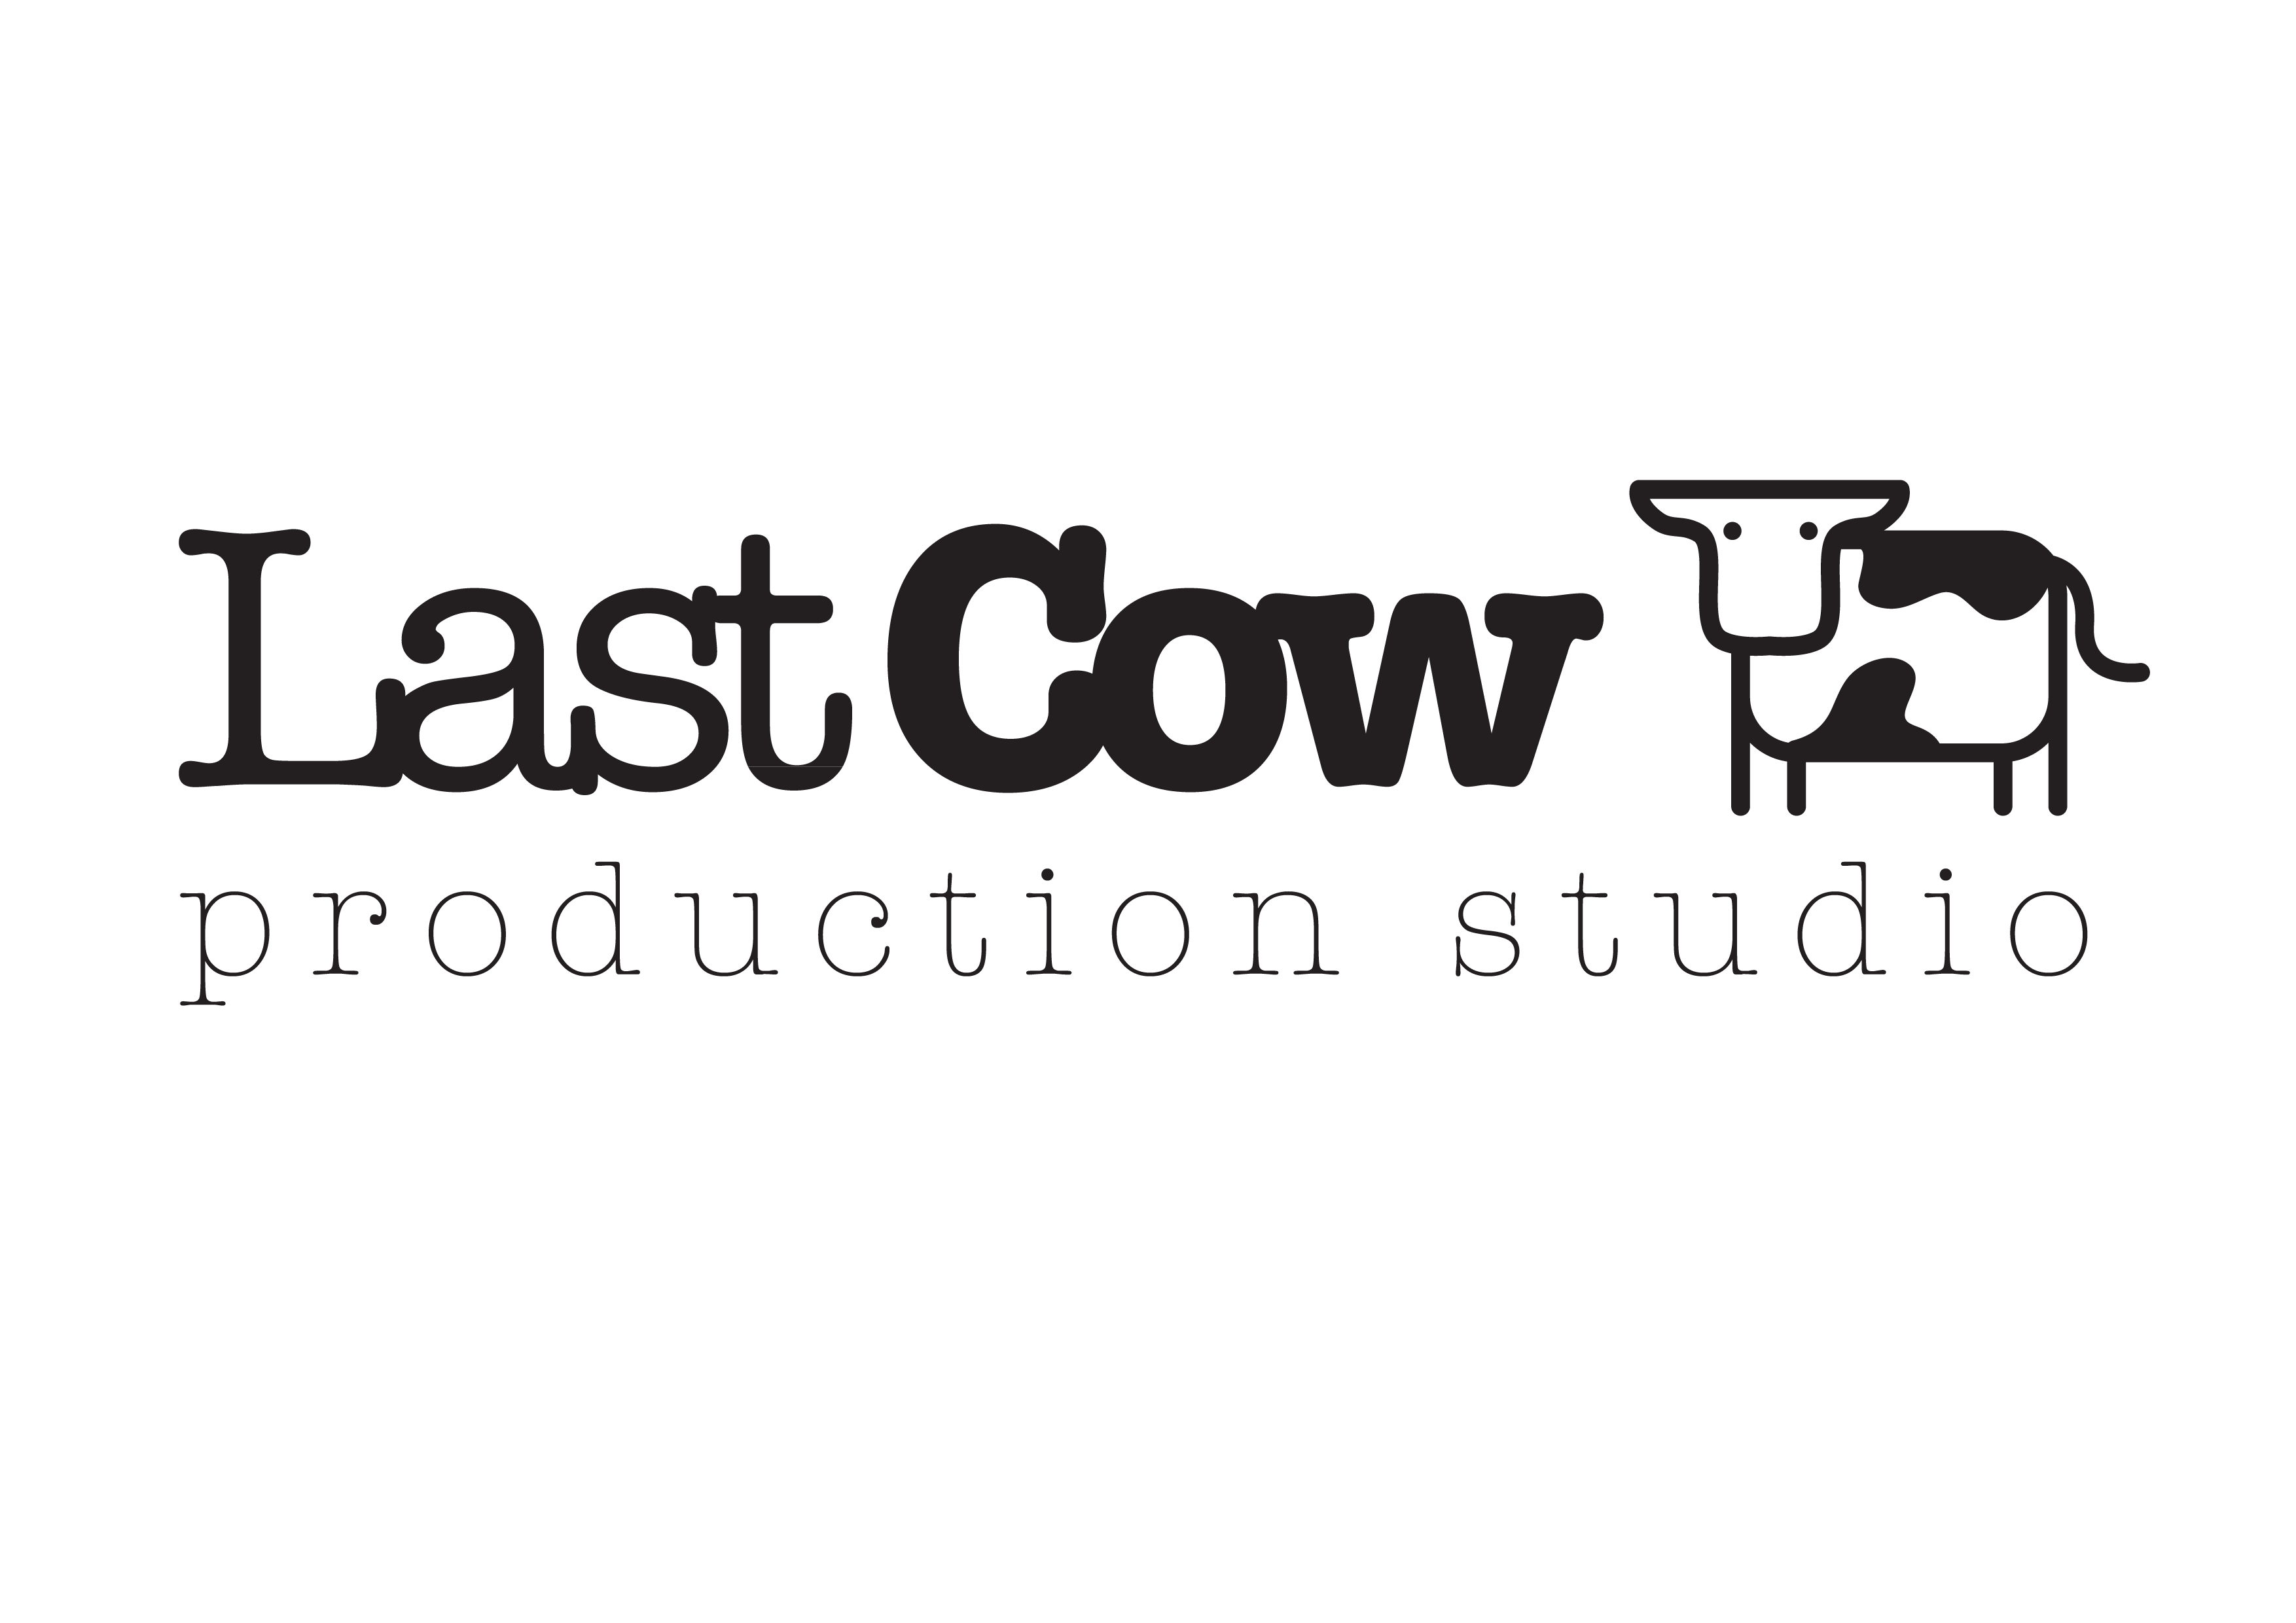 Last Cow logo